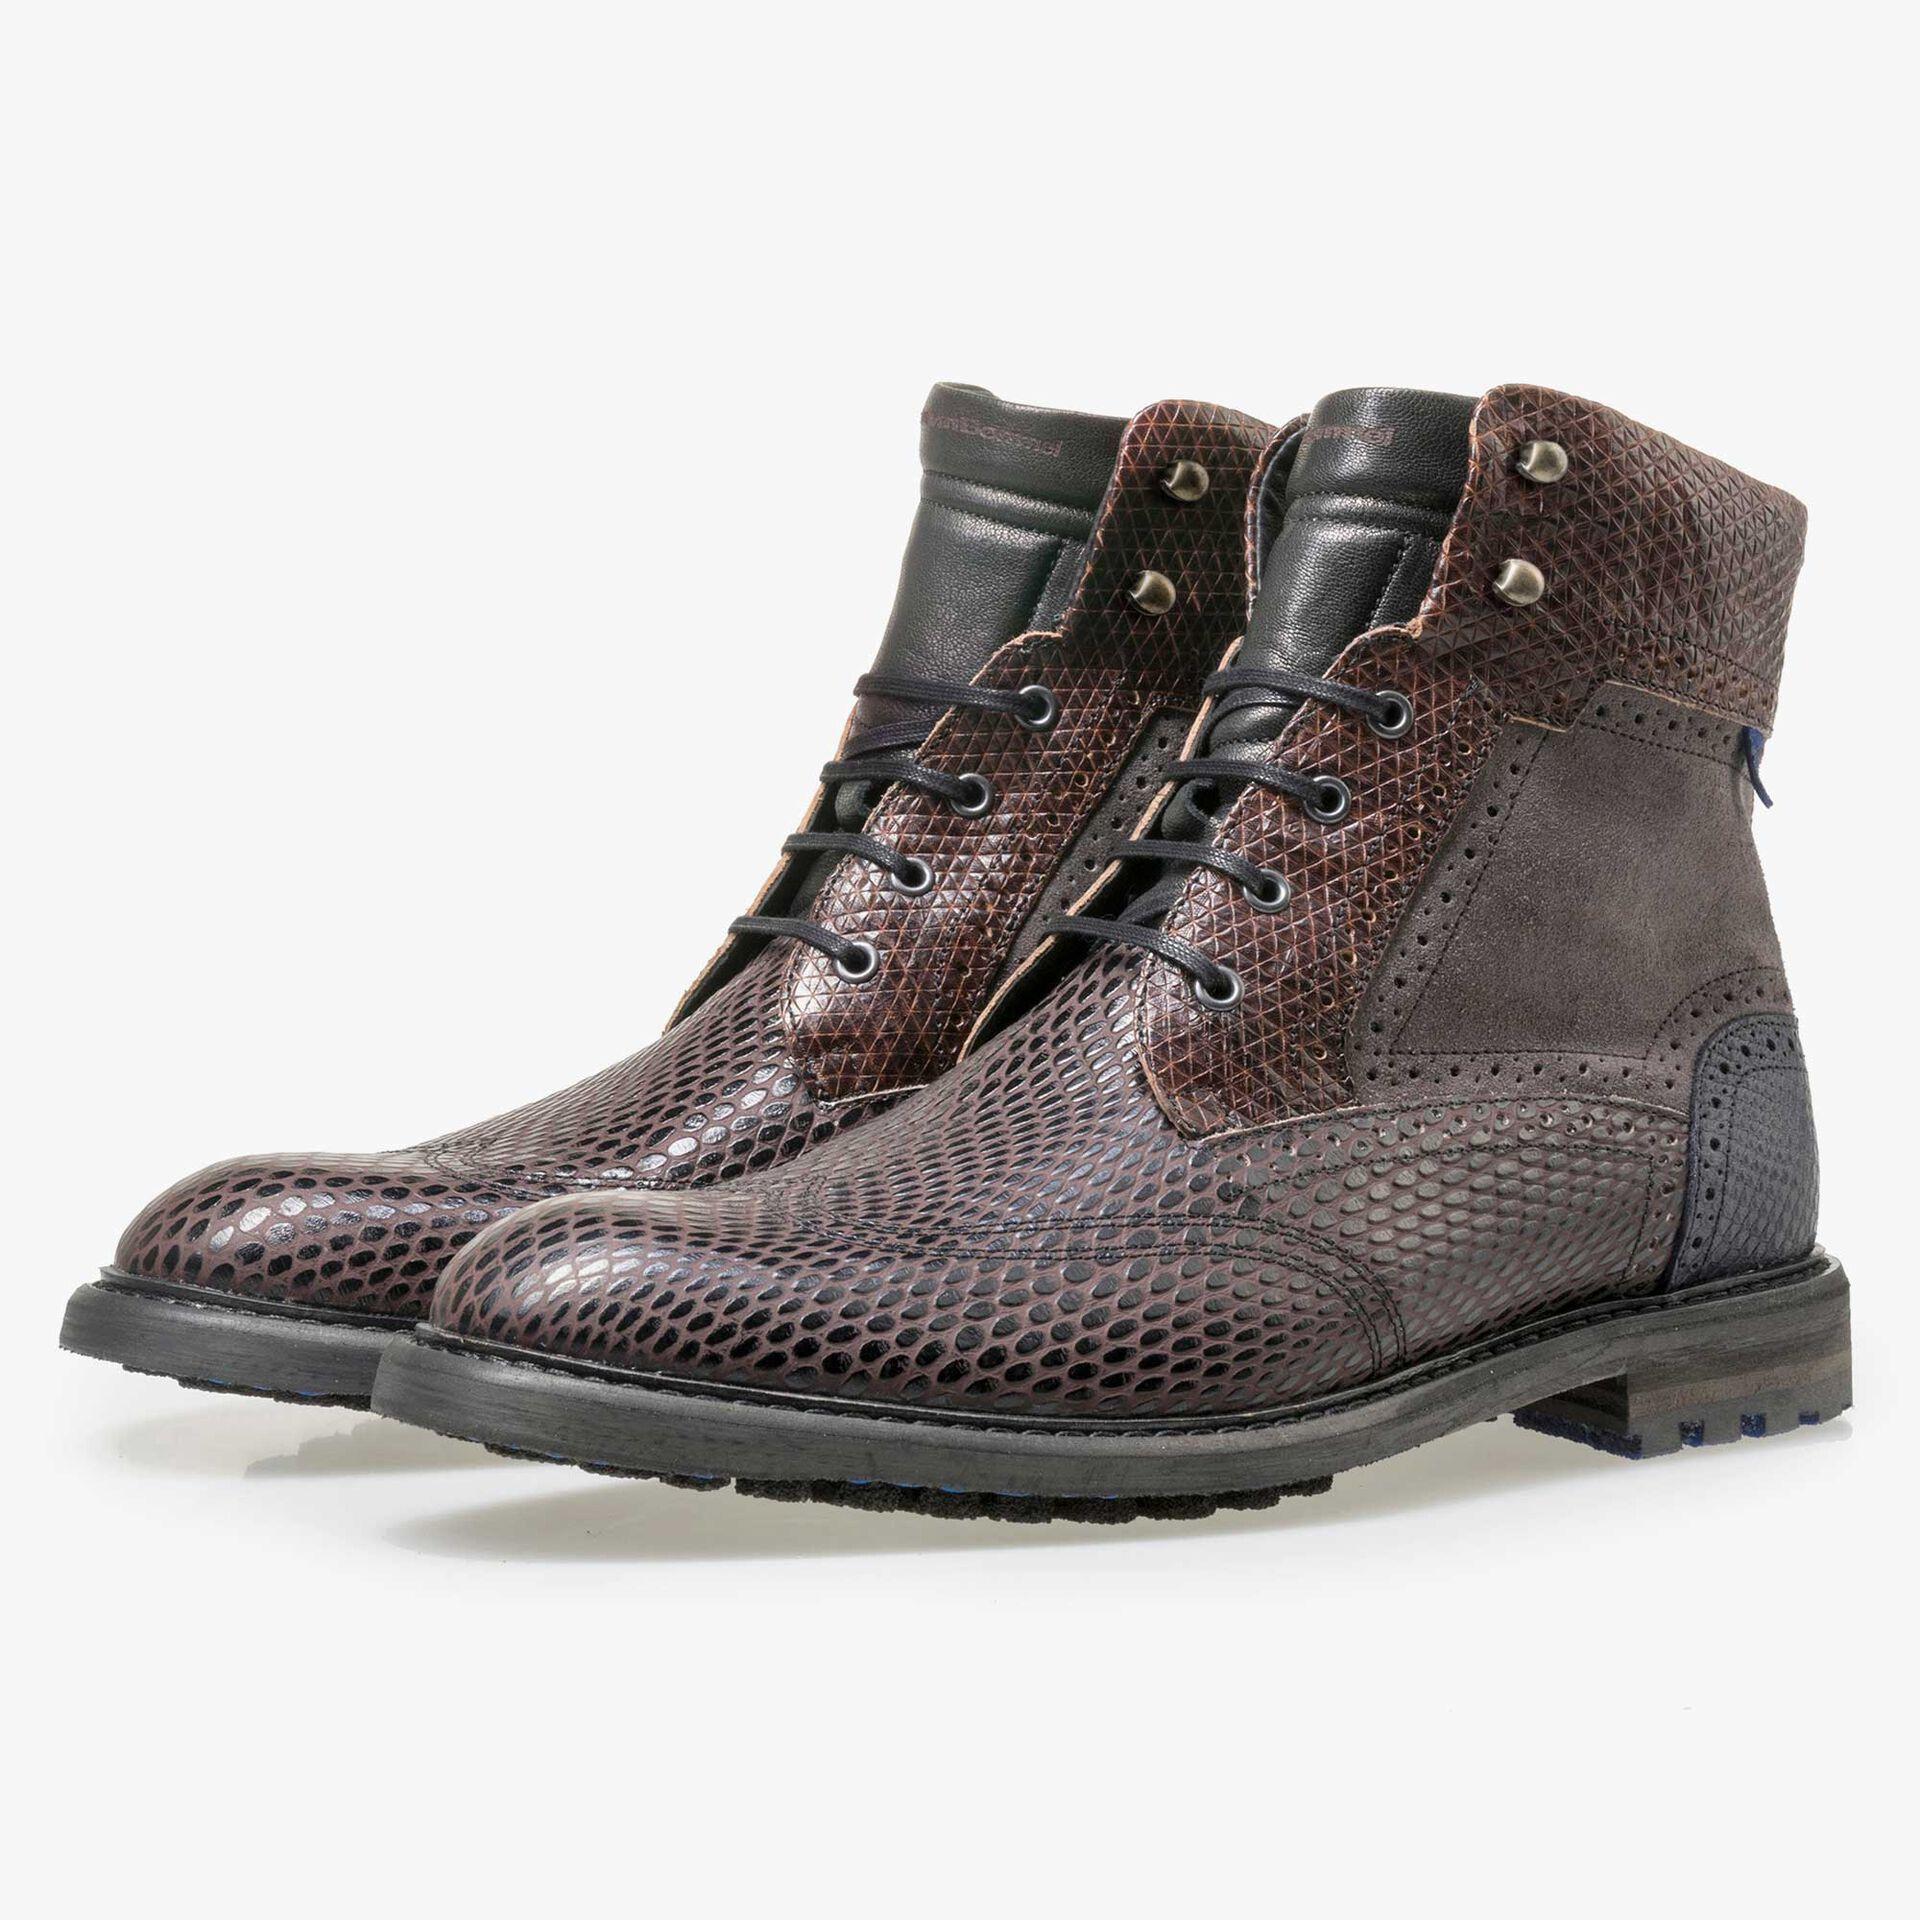 Floris van Bommel dark brown high leather lace boot